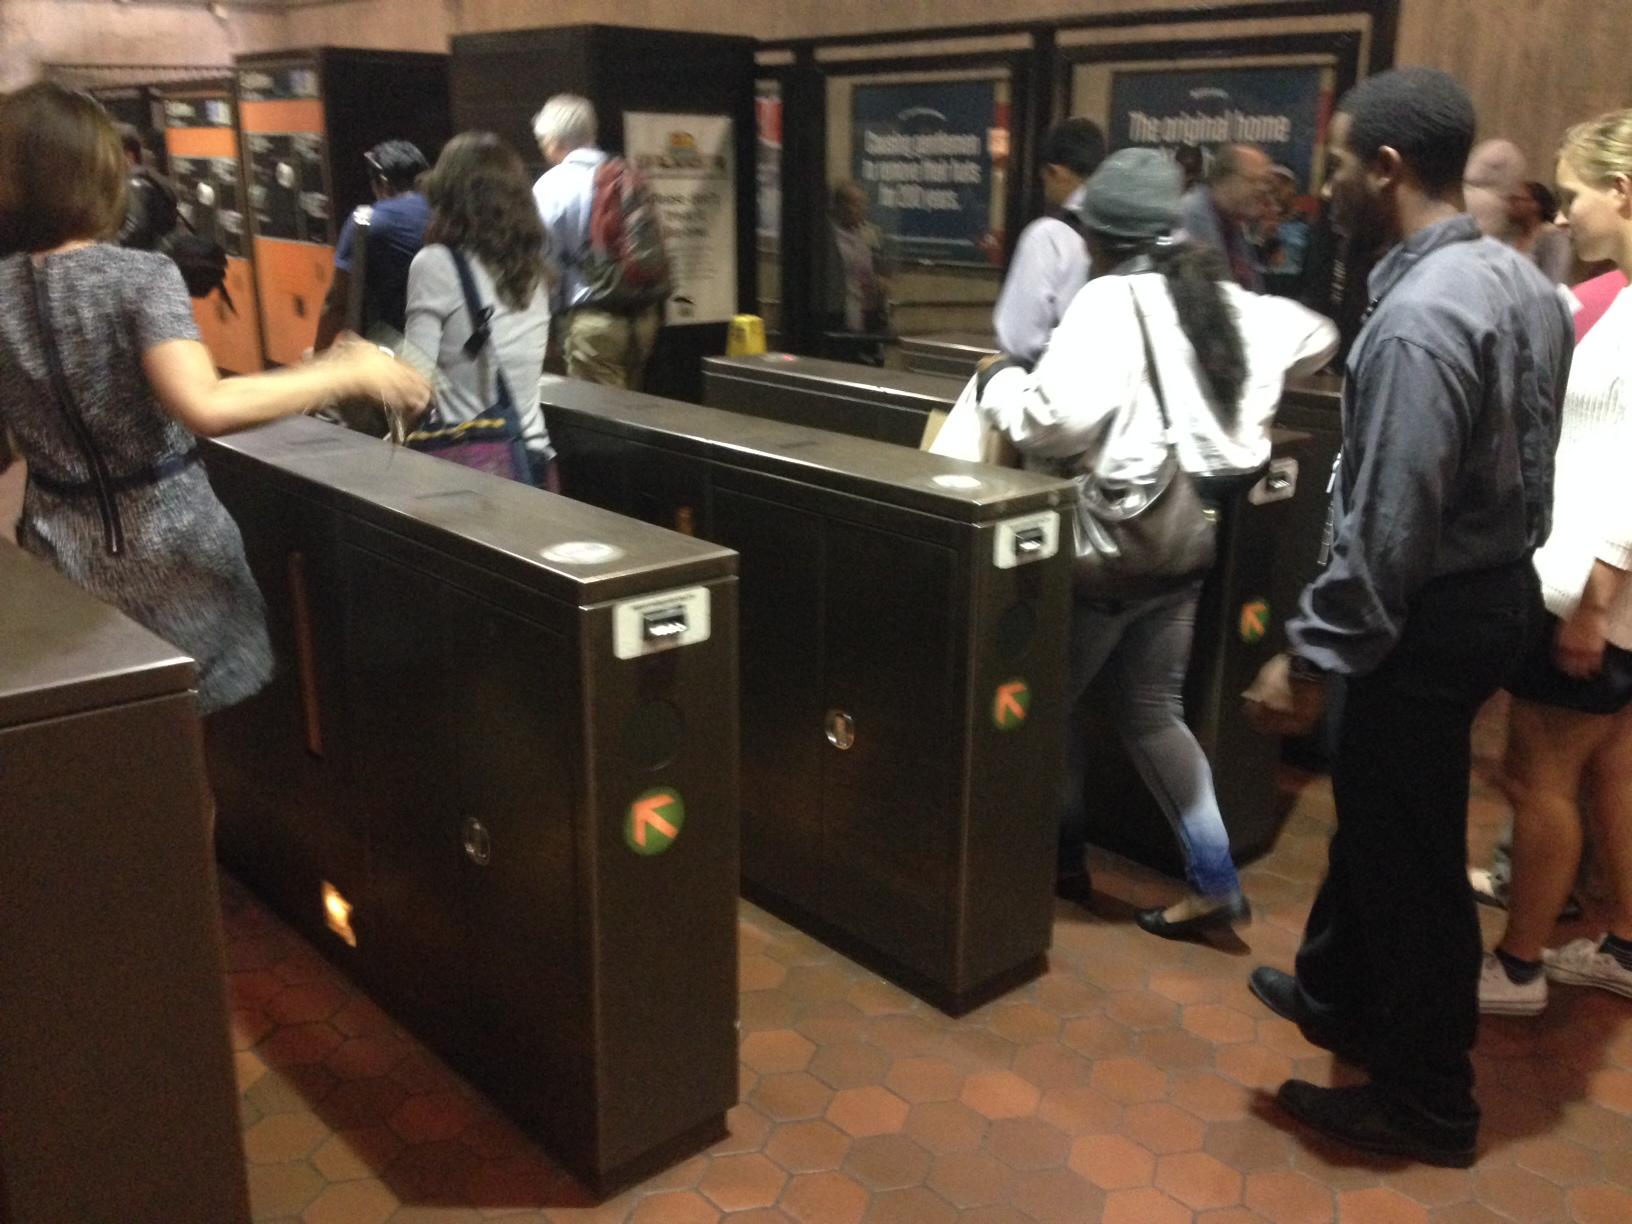 DC mayor vetoes bill decriminalizing fare evasion on Metro